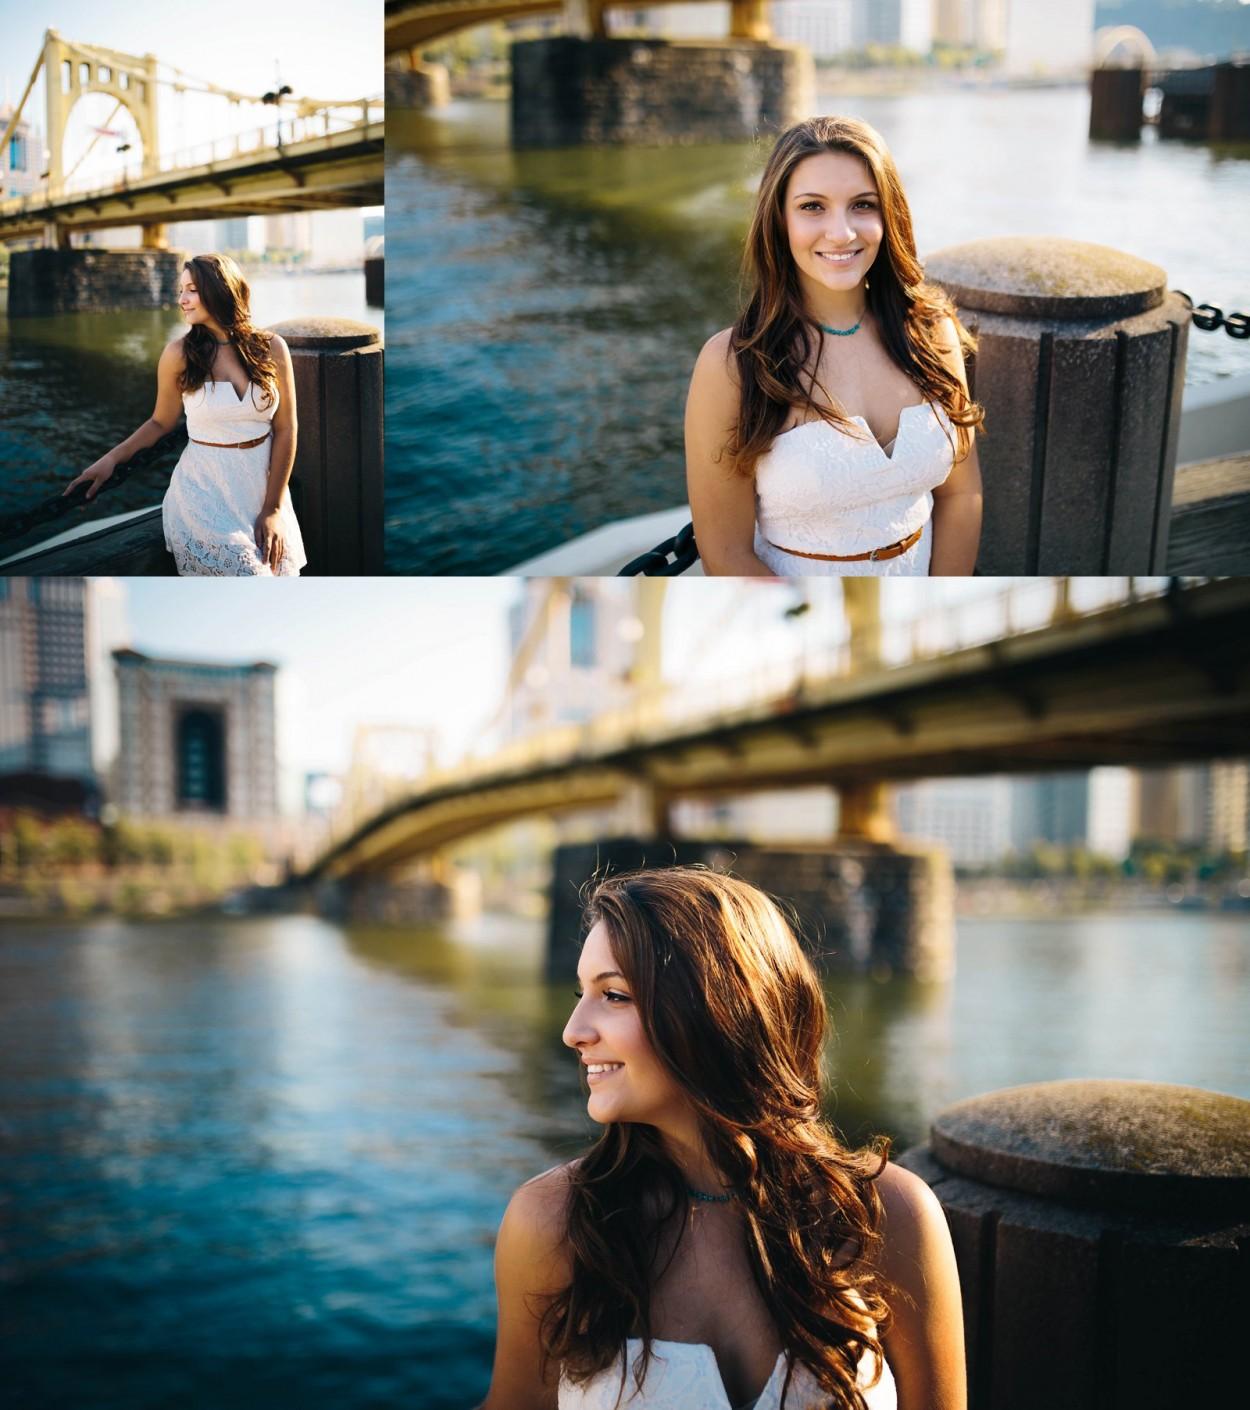 wild-native-photography-senior-portrait-photographer-pittsburgh-nadia_0164